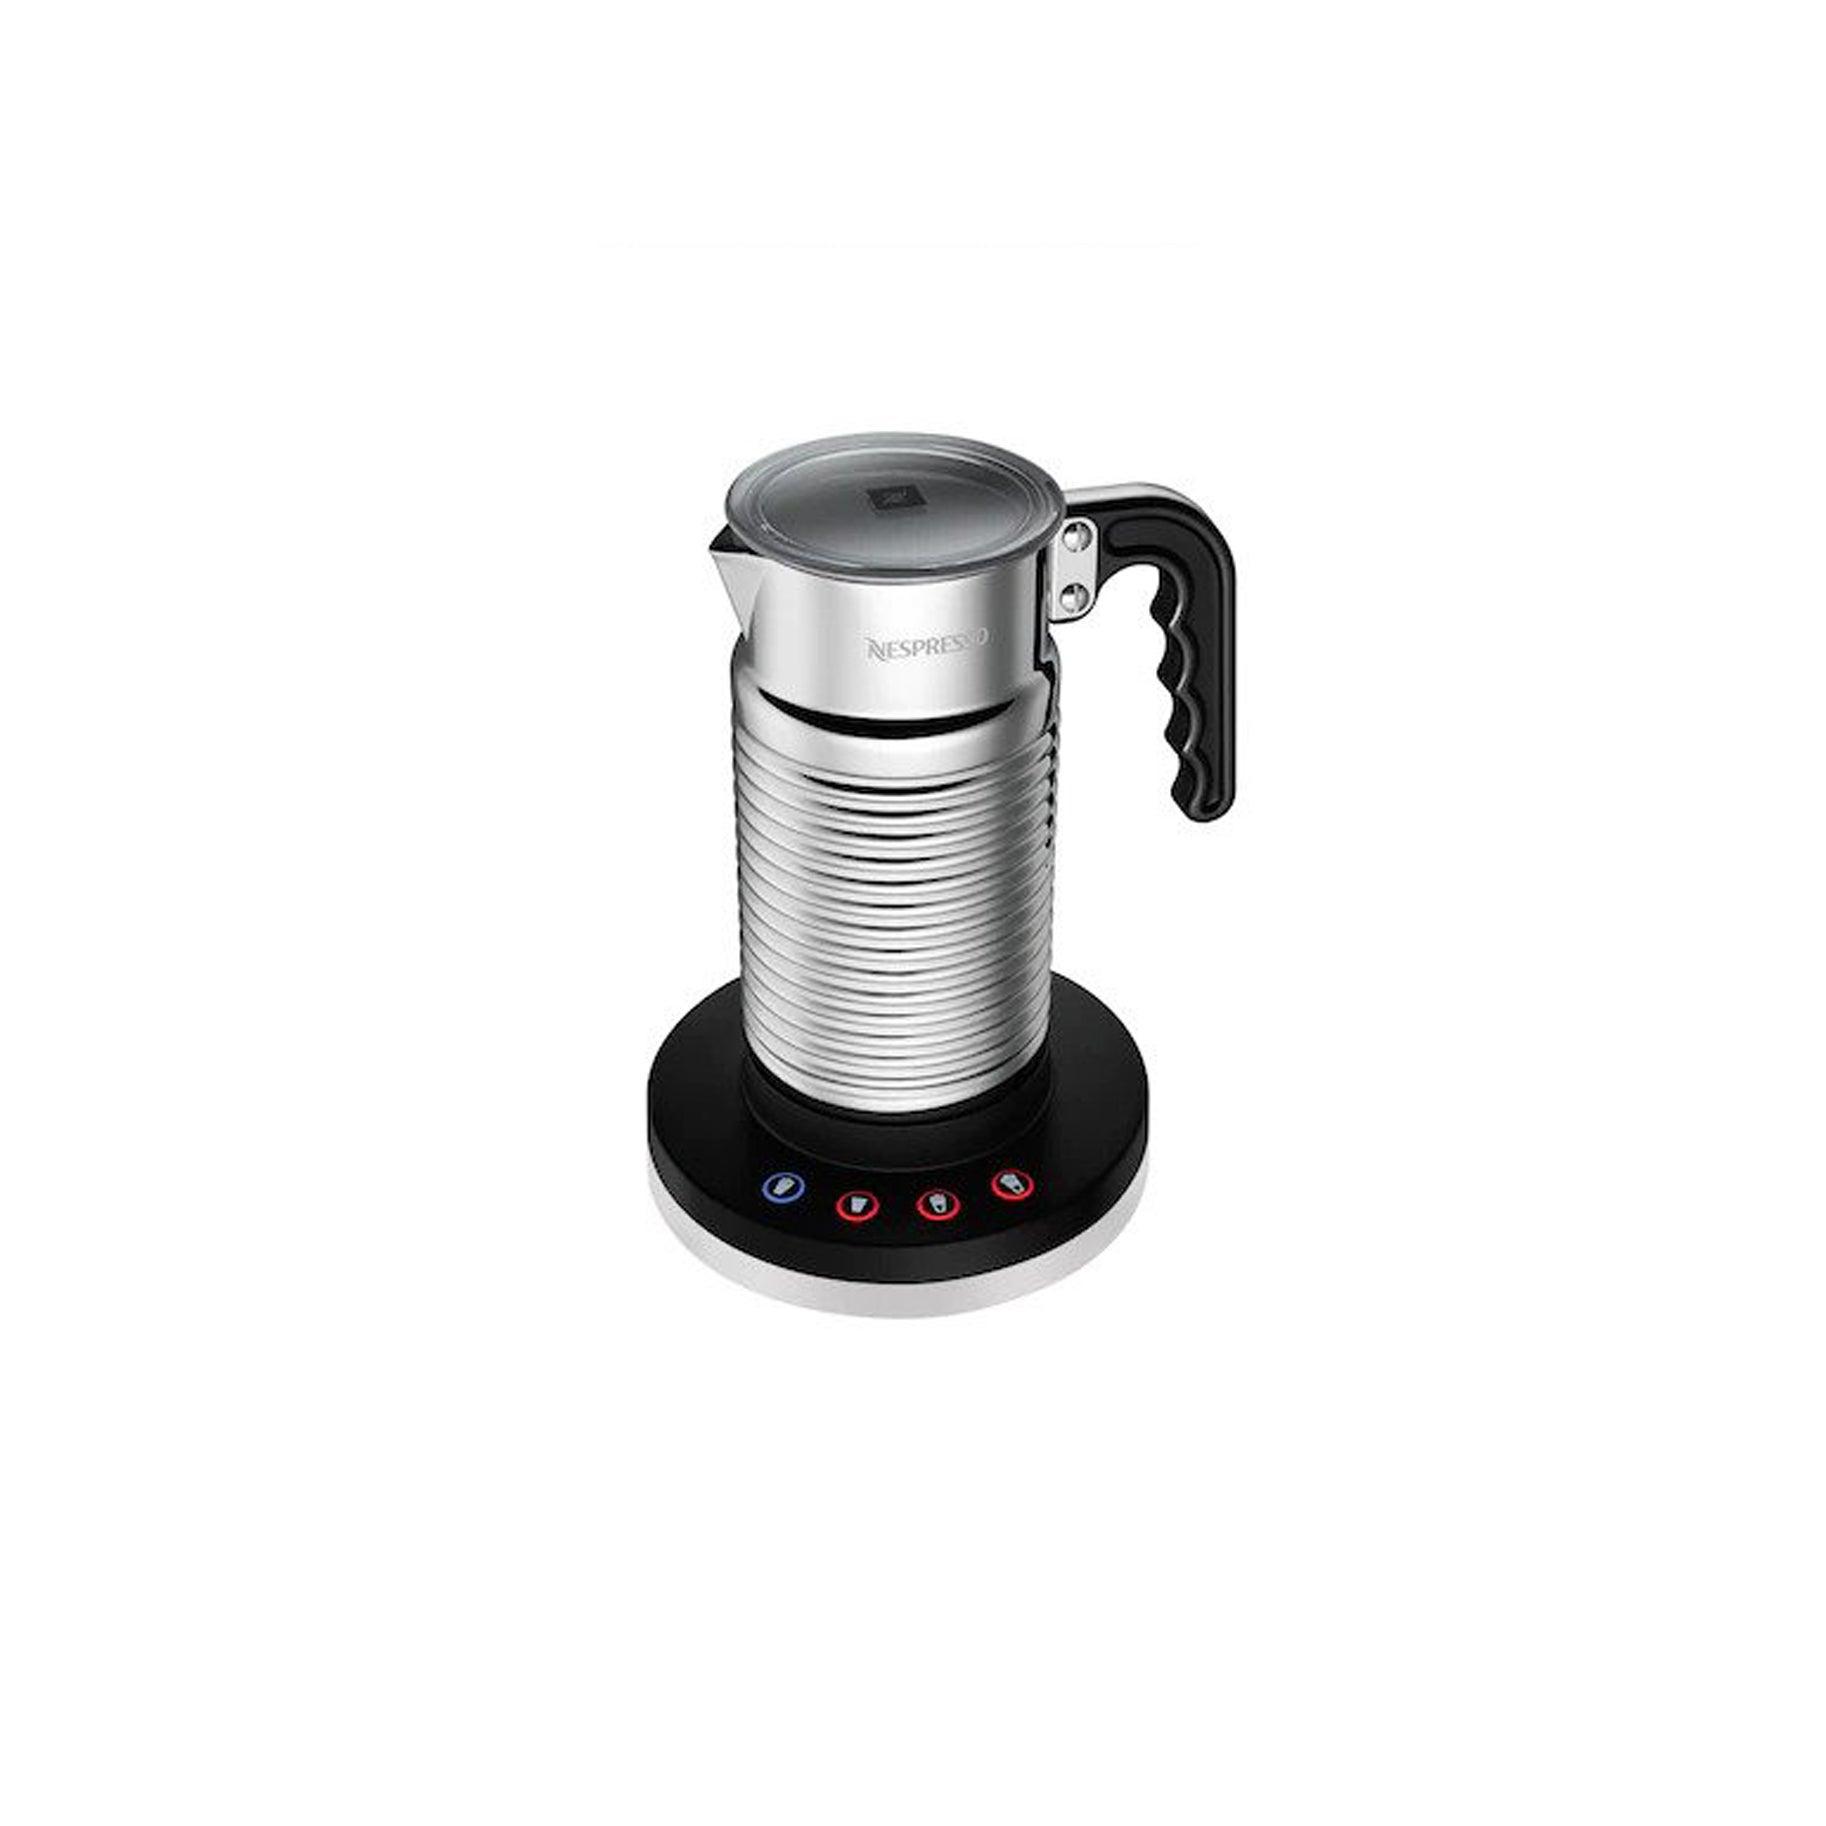 The Best Milk Frother Option: Nespresso Aeroccino4